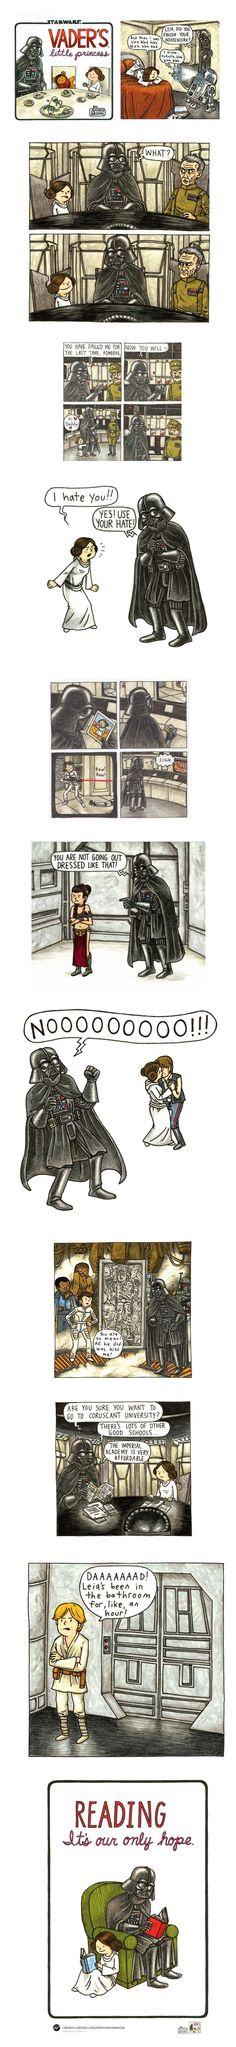 (Vader's Little Princess by Jeffrey Brown)